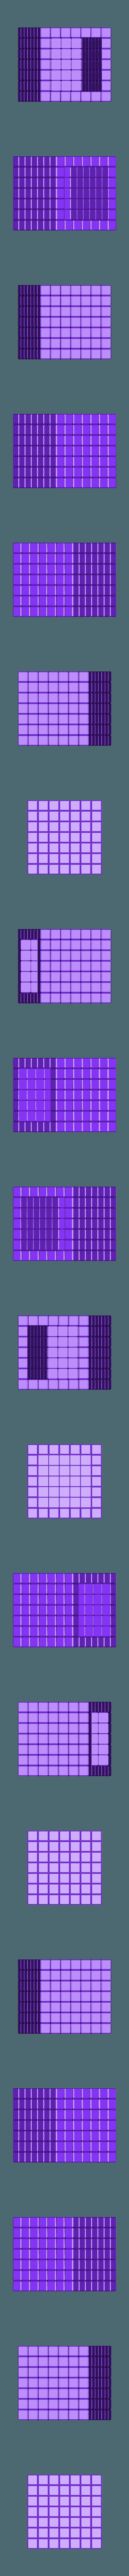 sevenBot.stl Download free STL file Nesting Cubes, Recursive Cubes, Cubes within Cubes • 3D printer template, LGBU